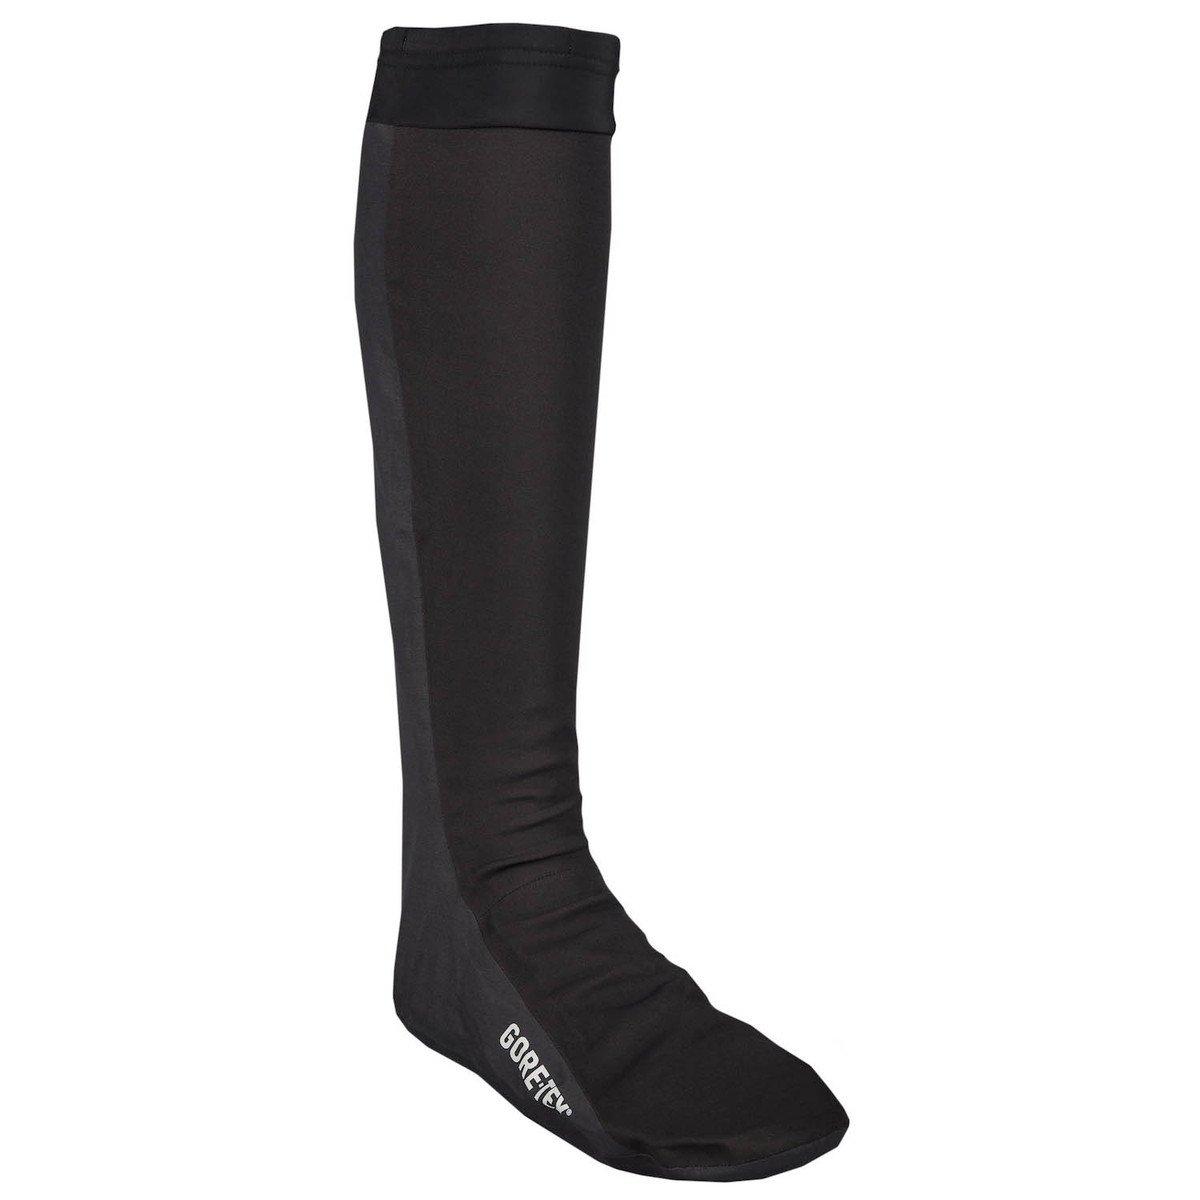 Klim Covert Gore-Tex Socks Black XL